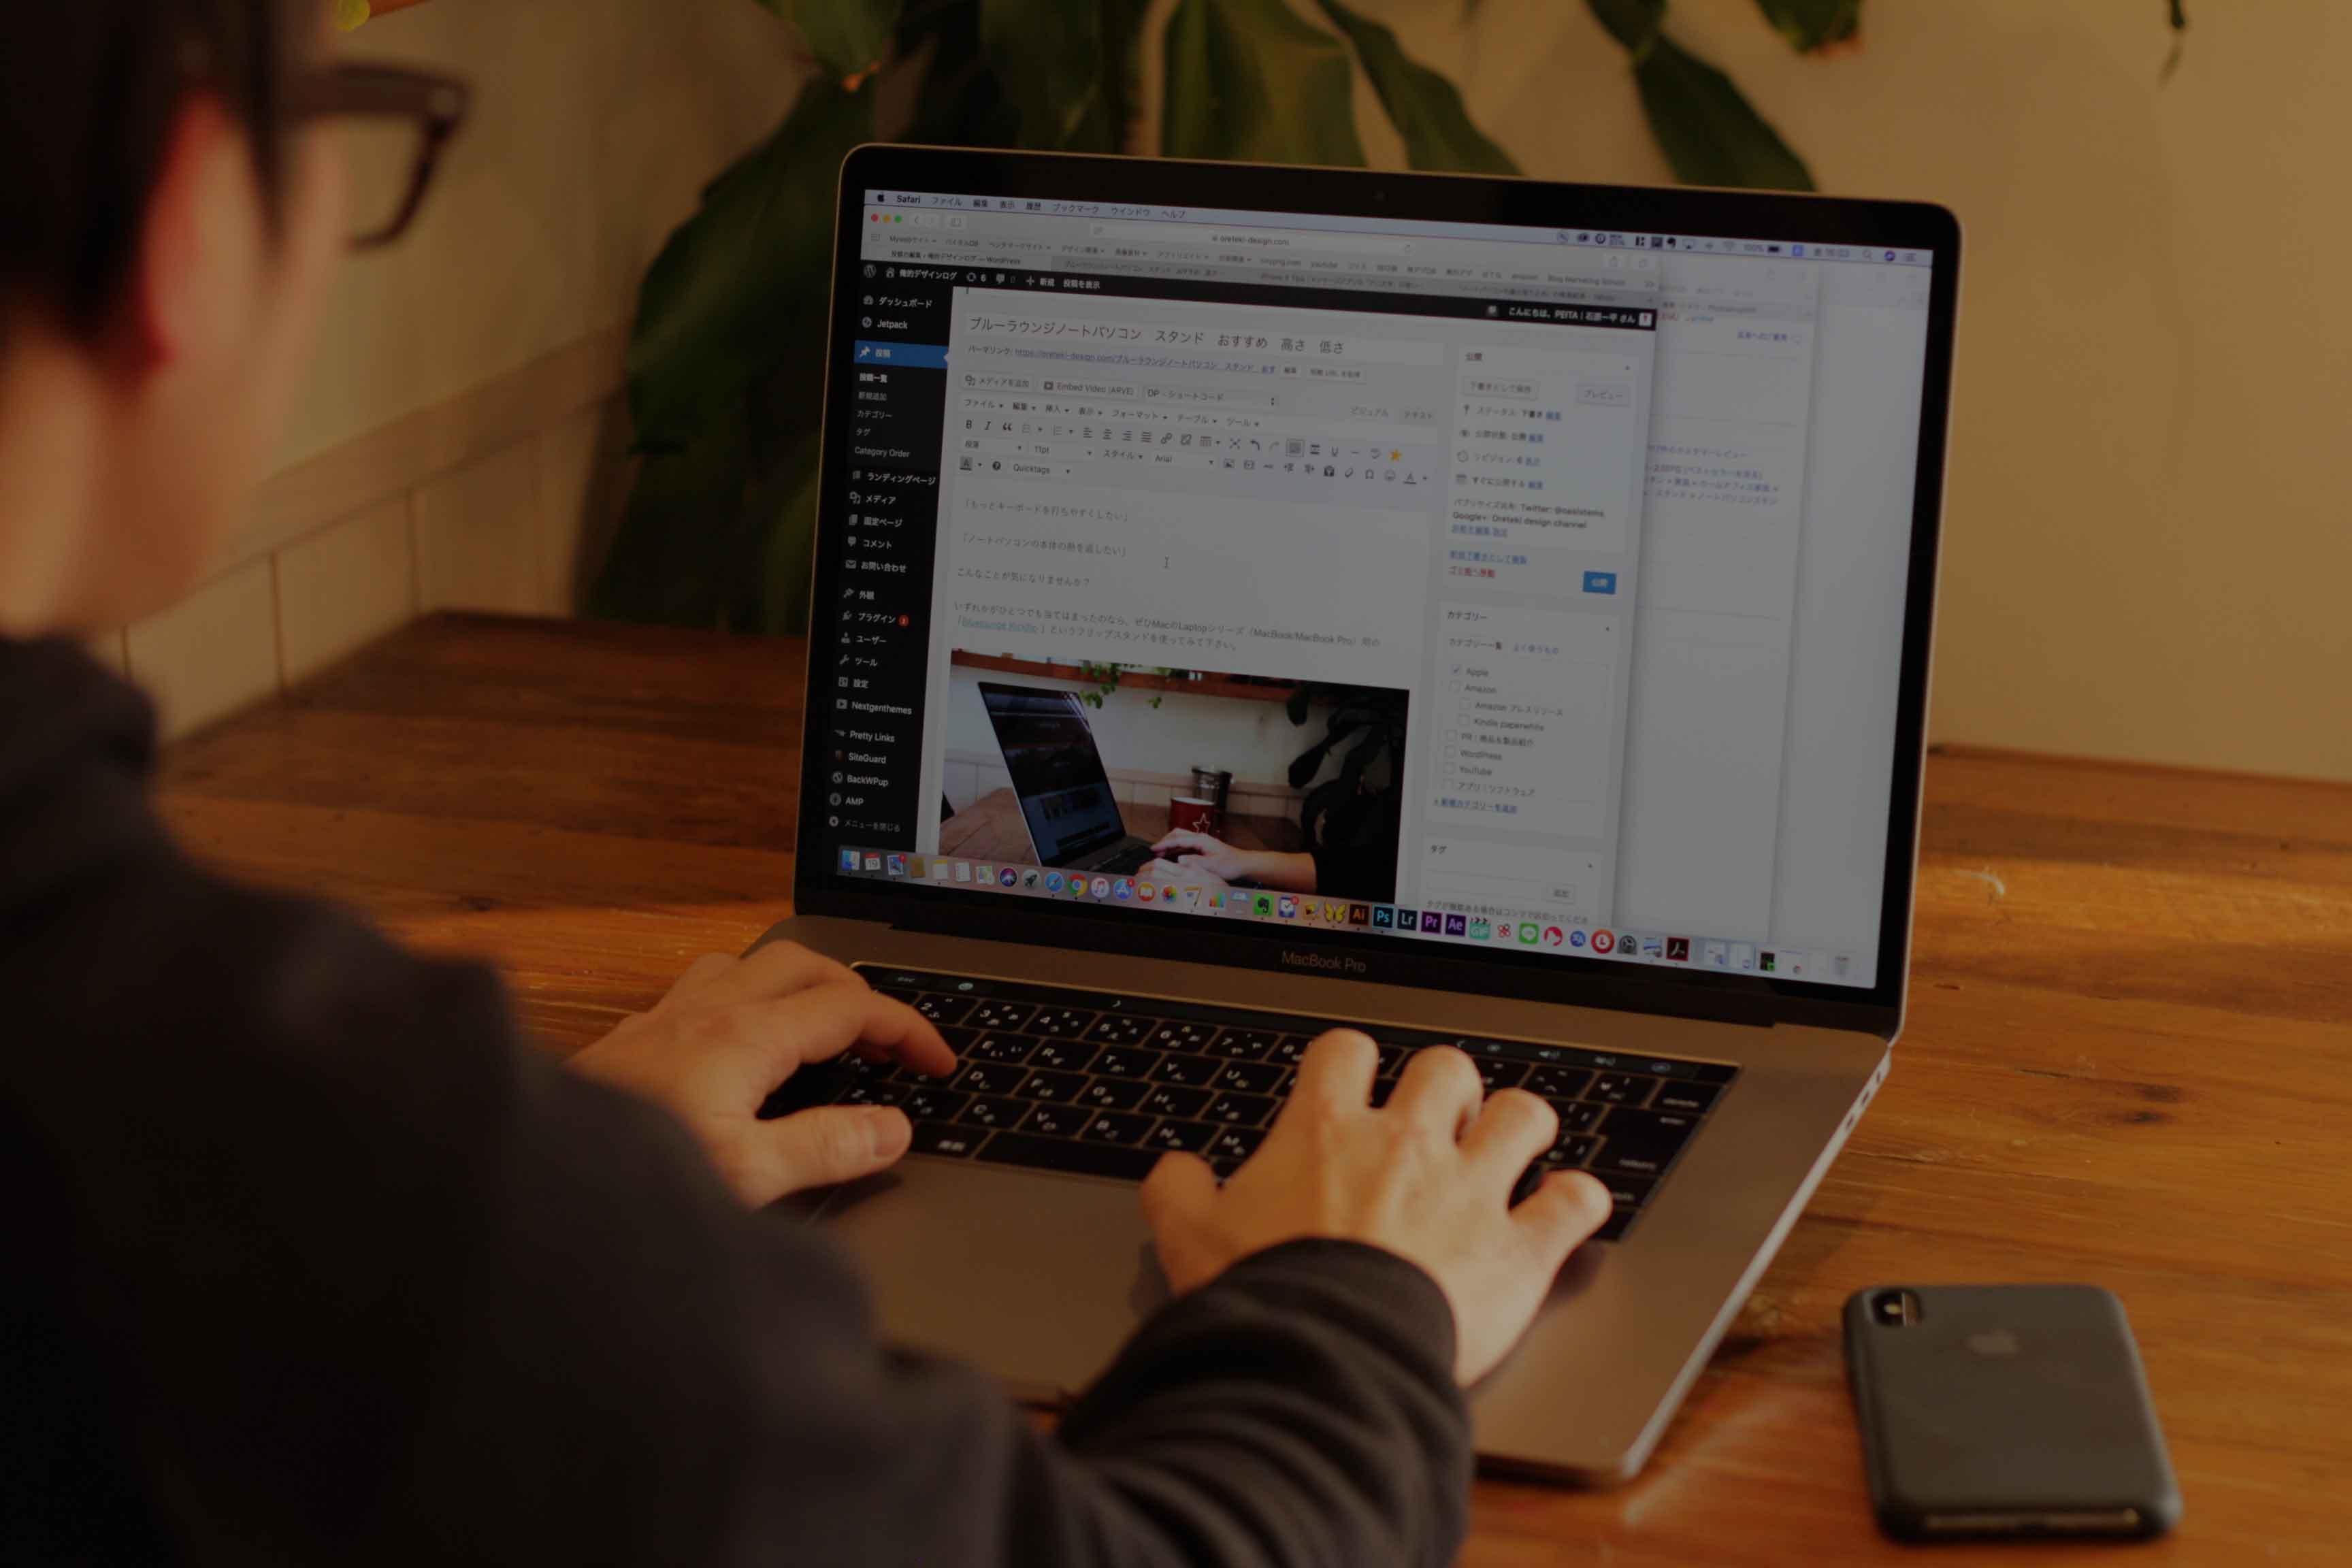 Macのプレビューで露出を暗めにした写真